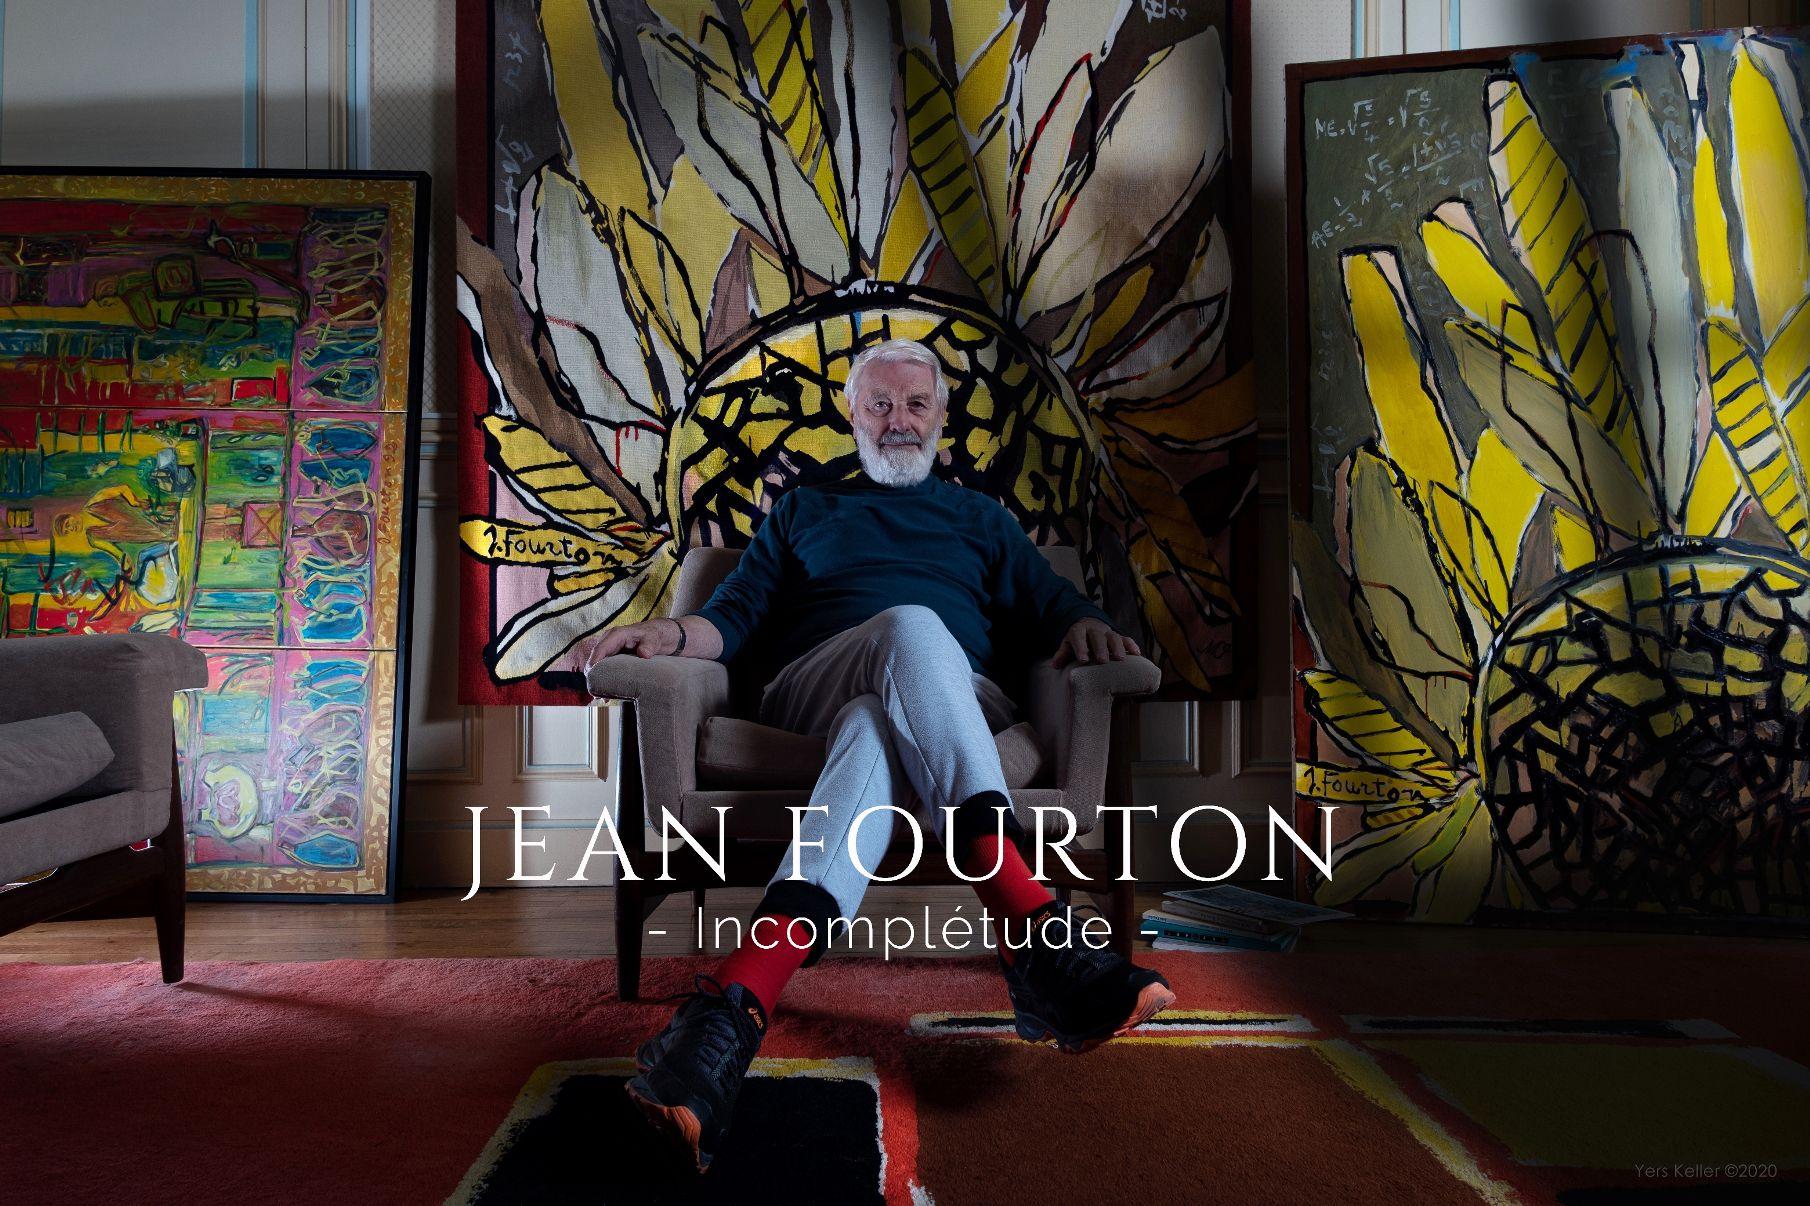 Jean Fourton par Yers Keller